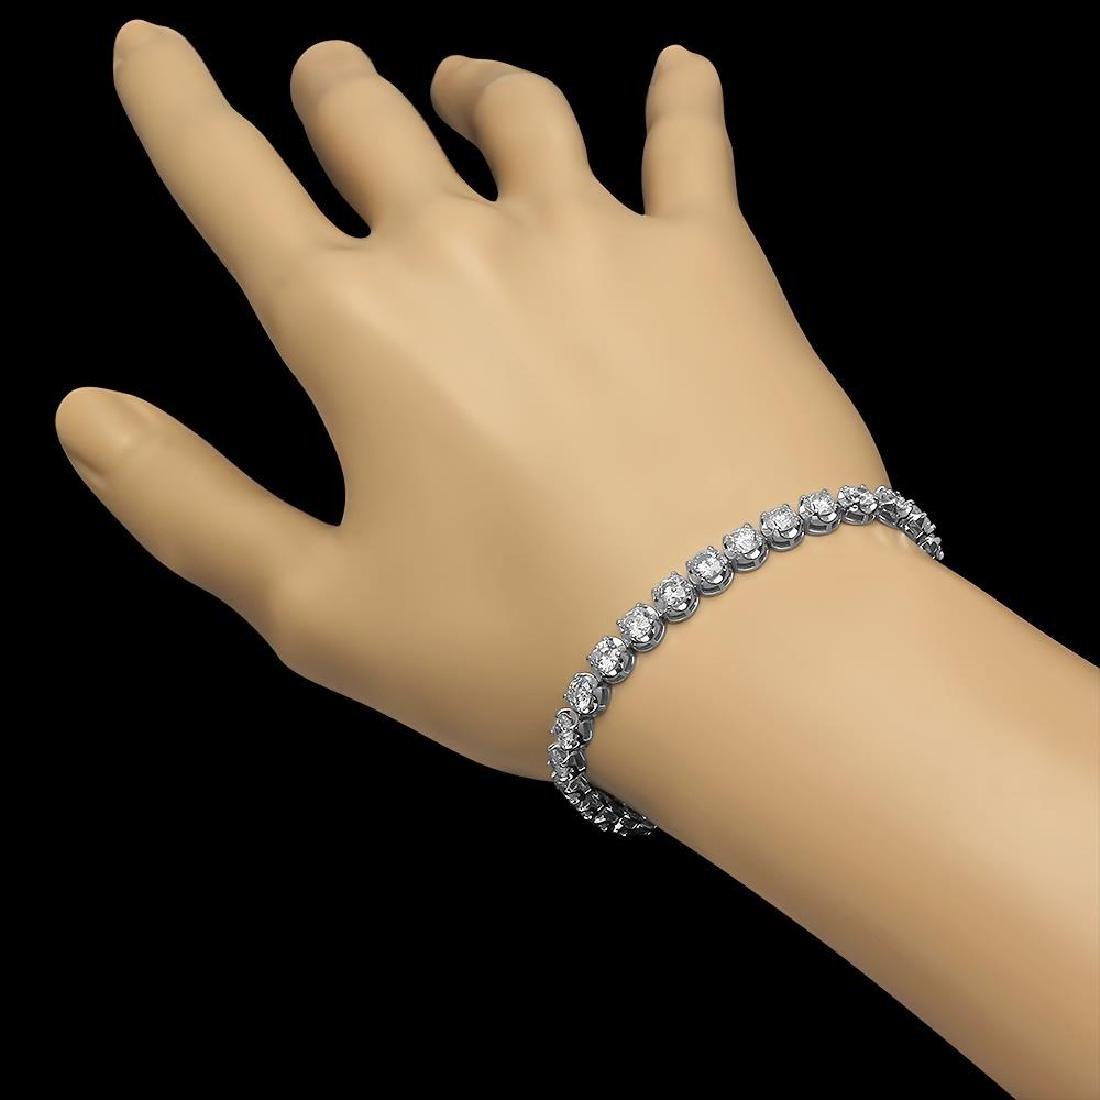 18K Gold 8.54ct Diamond Bracelet - 2